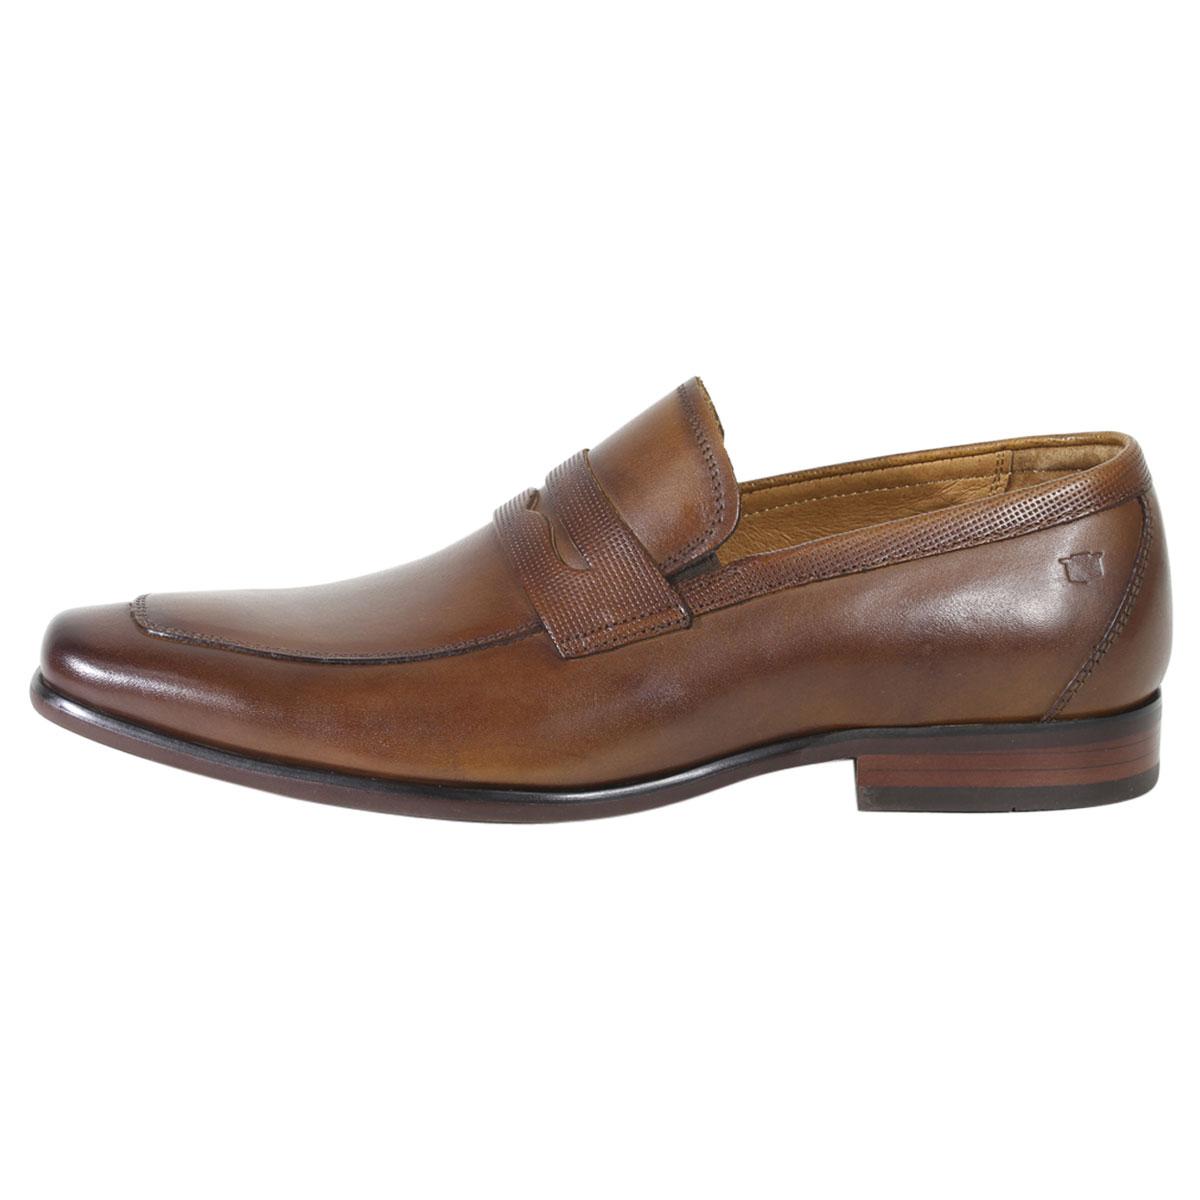 Florsheim-Men-039-s-Postino-Penny-Loafers-Shoes thumbnail 17